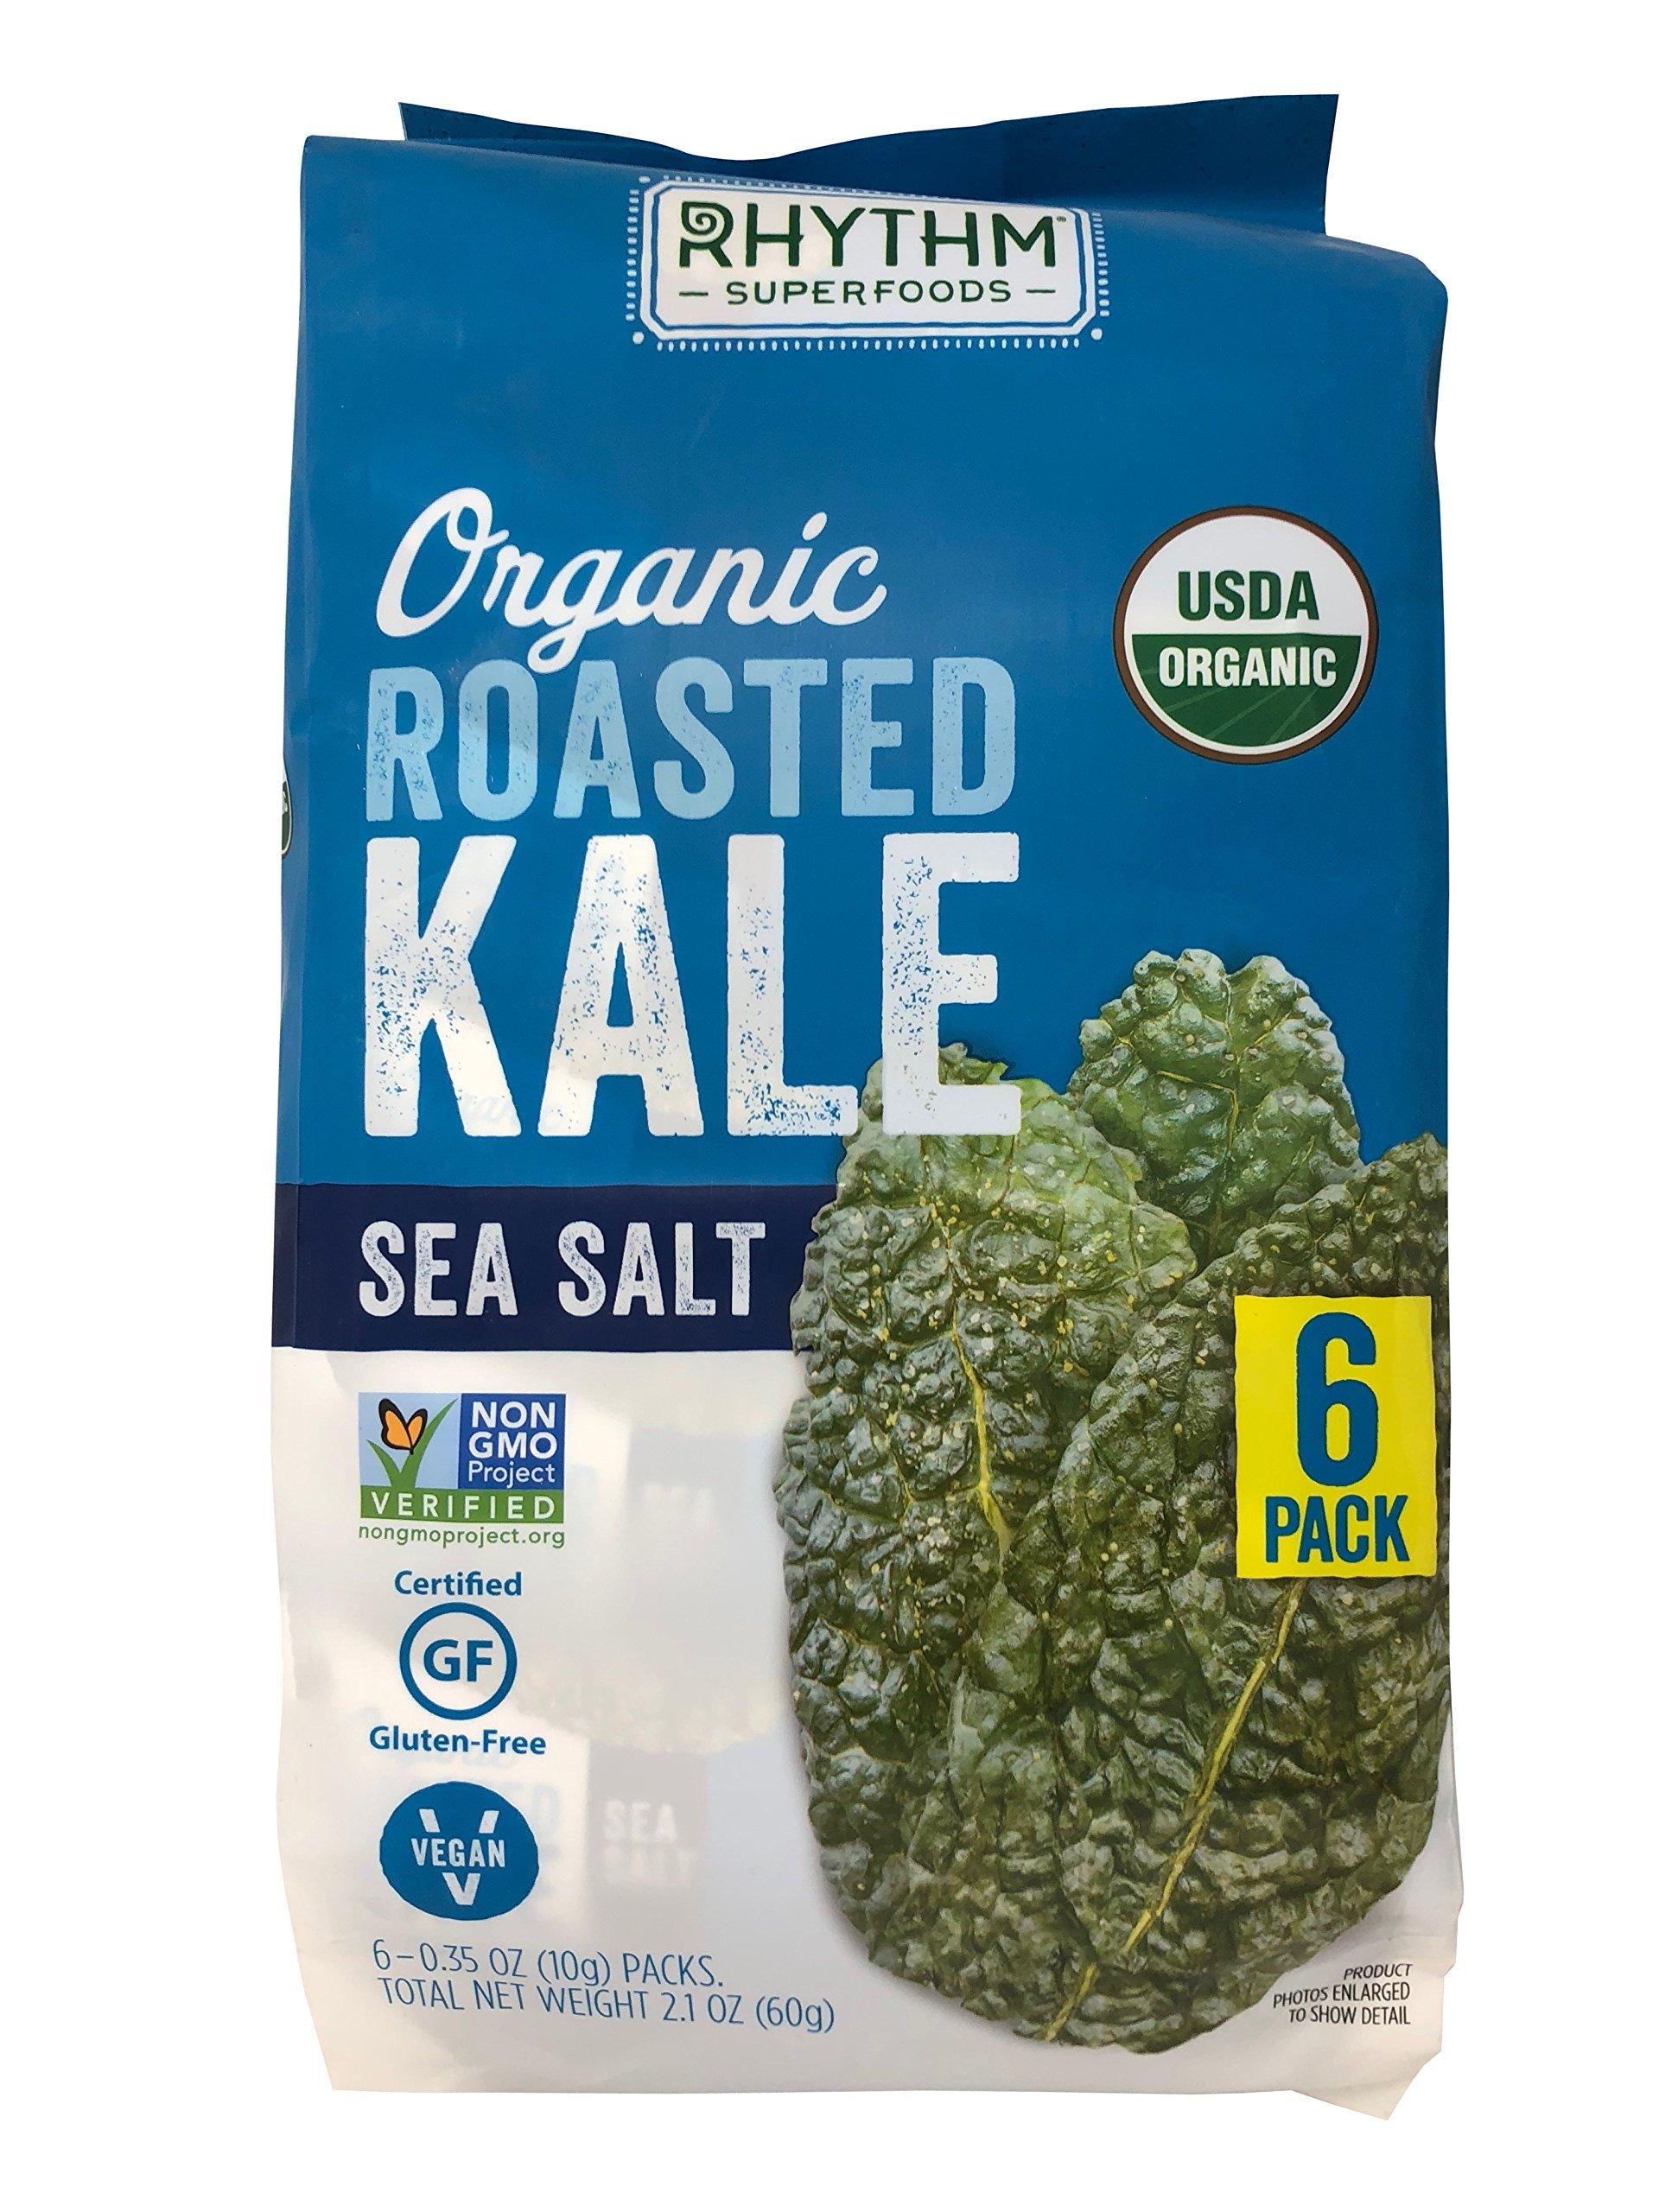 Rhythm Superfoods Organic Roasted Kale with Sea Salt 6-0.35 OZ Packs Net 2.1 OZ